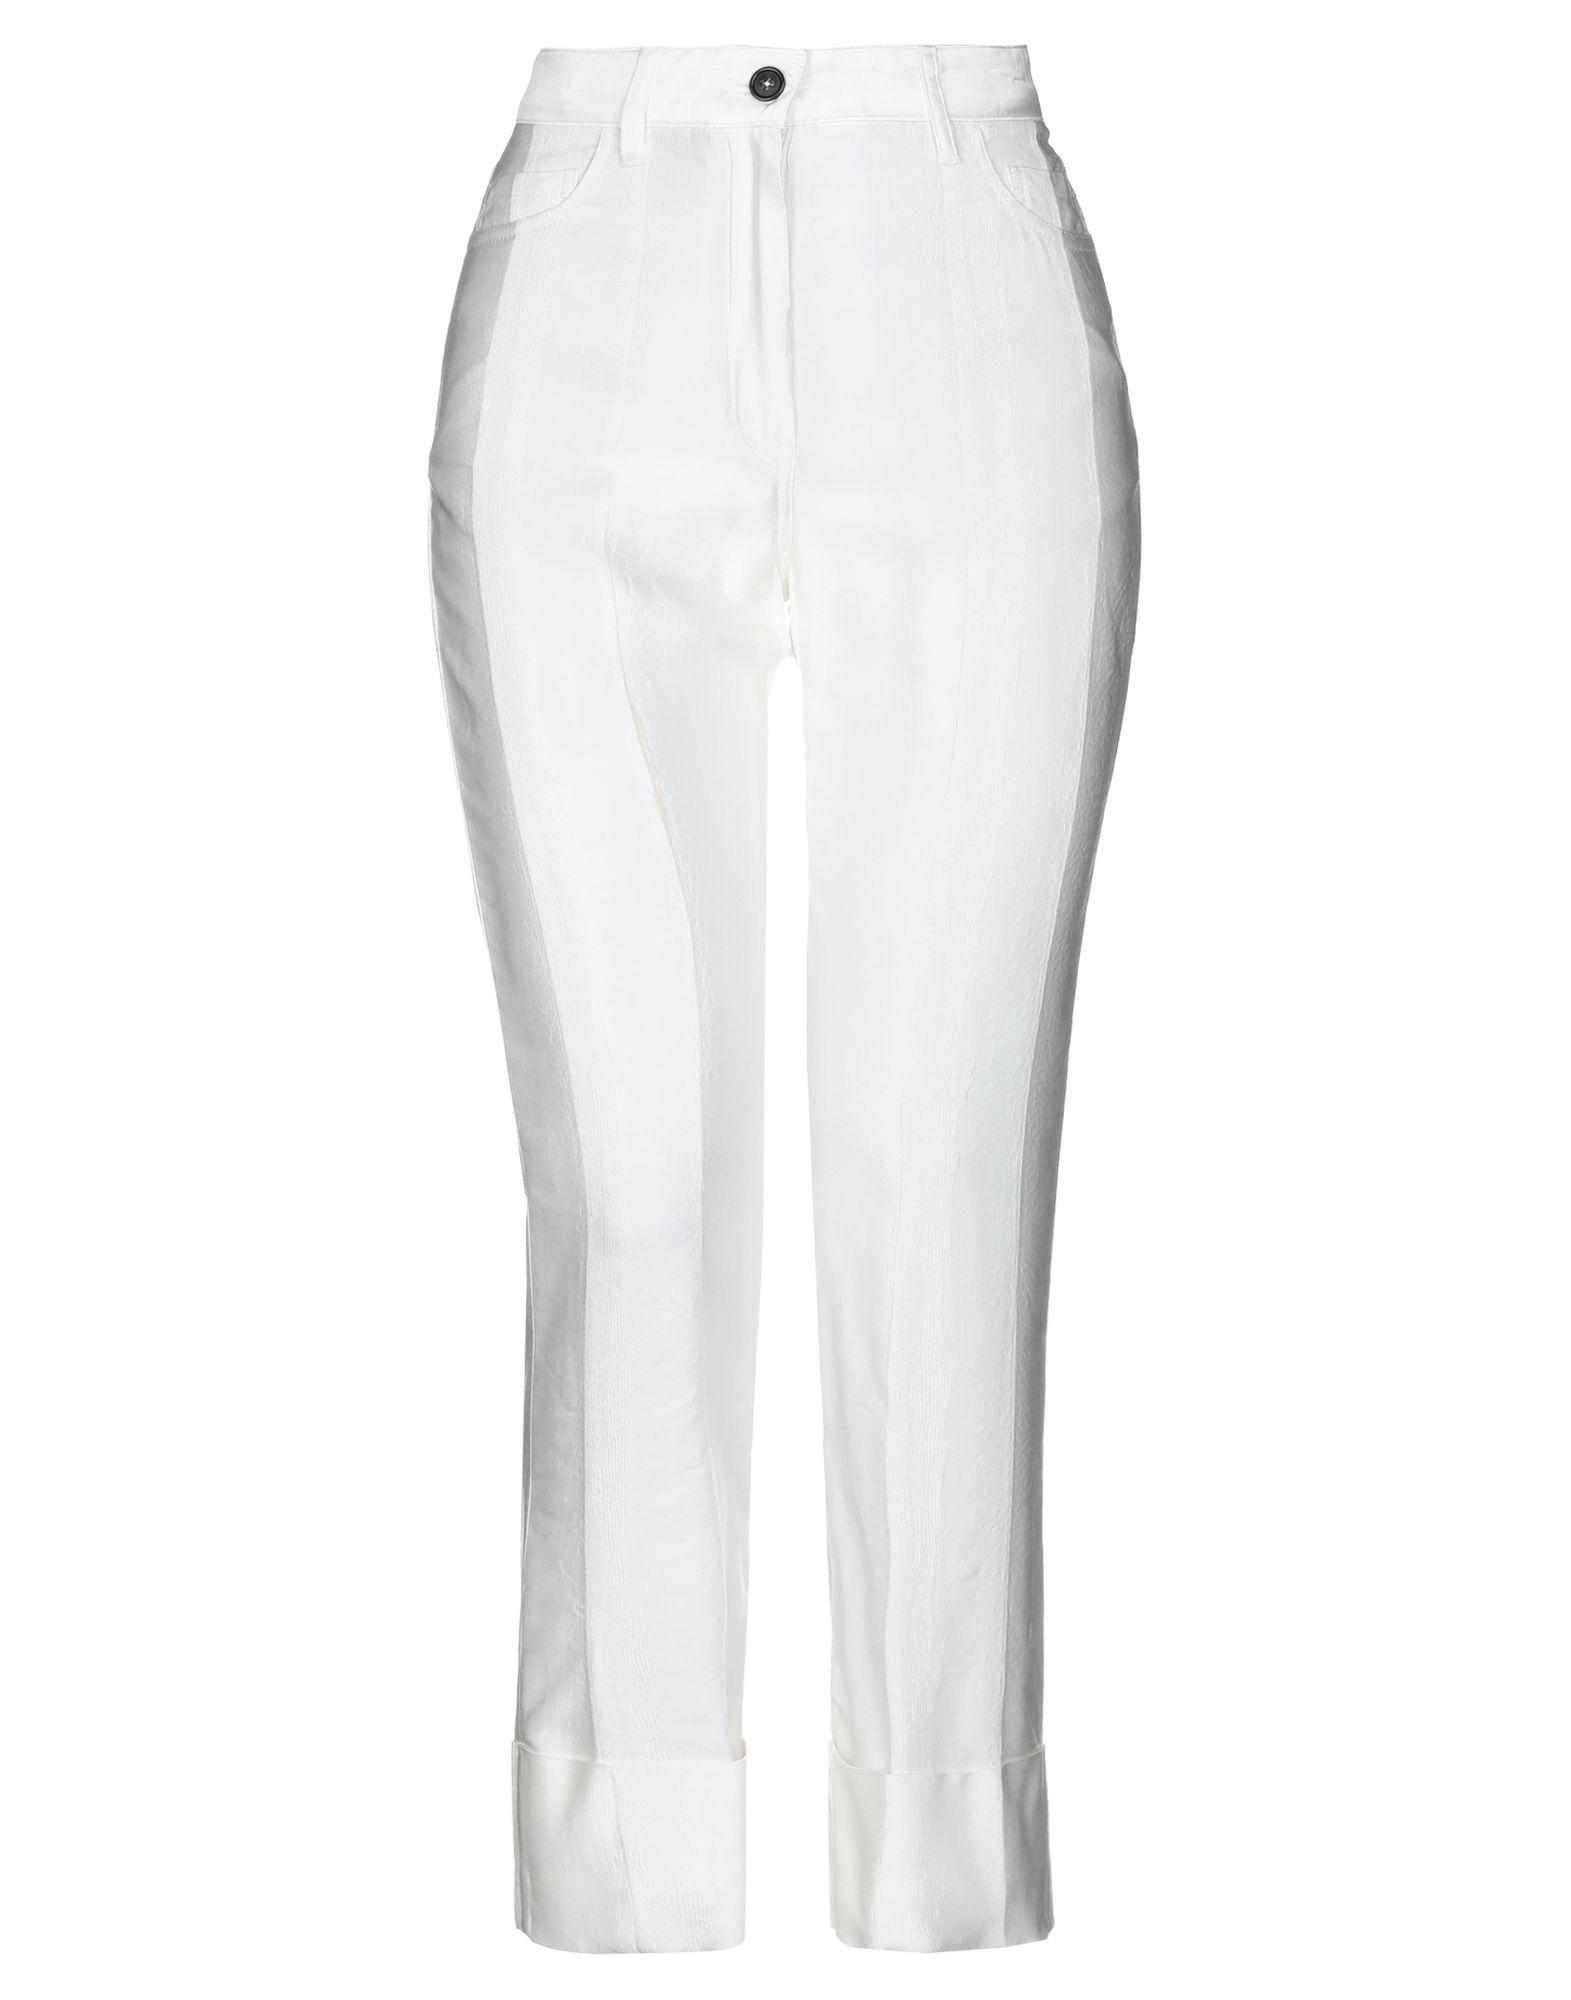 ANN DEMEULEMEESTER Повседневные брюки ann demeulemeester повседневные шорты